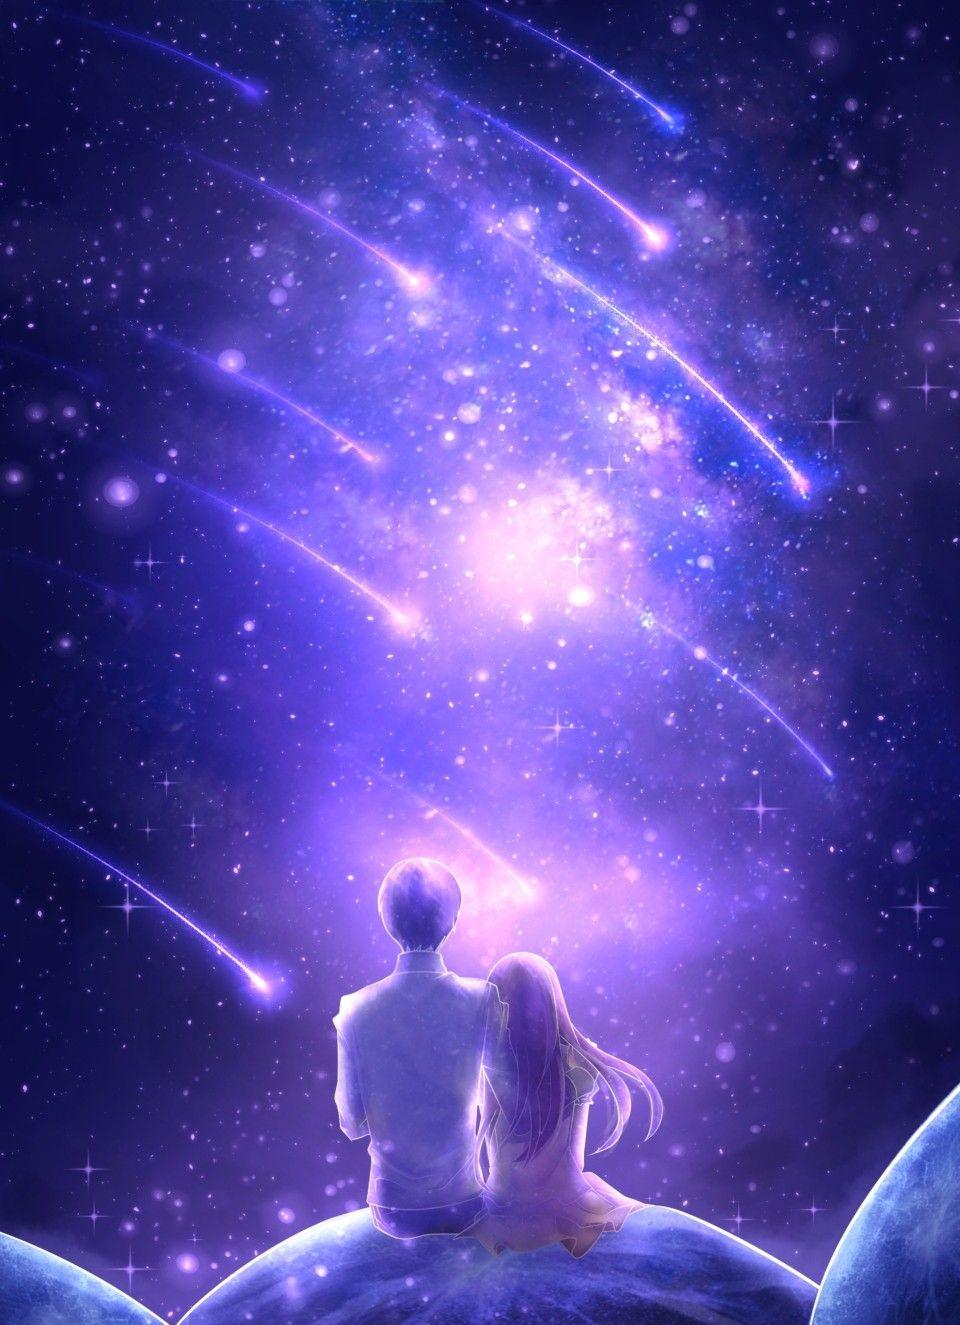 Anime galaxy wallpaper couple